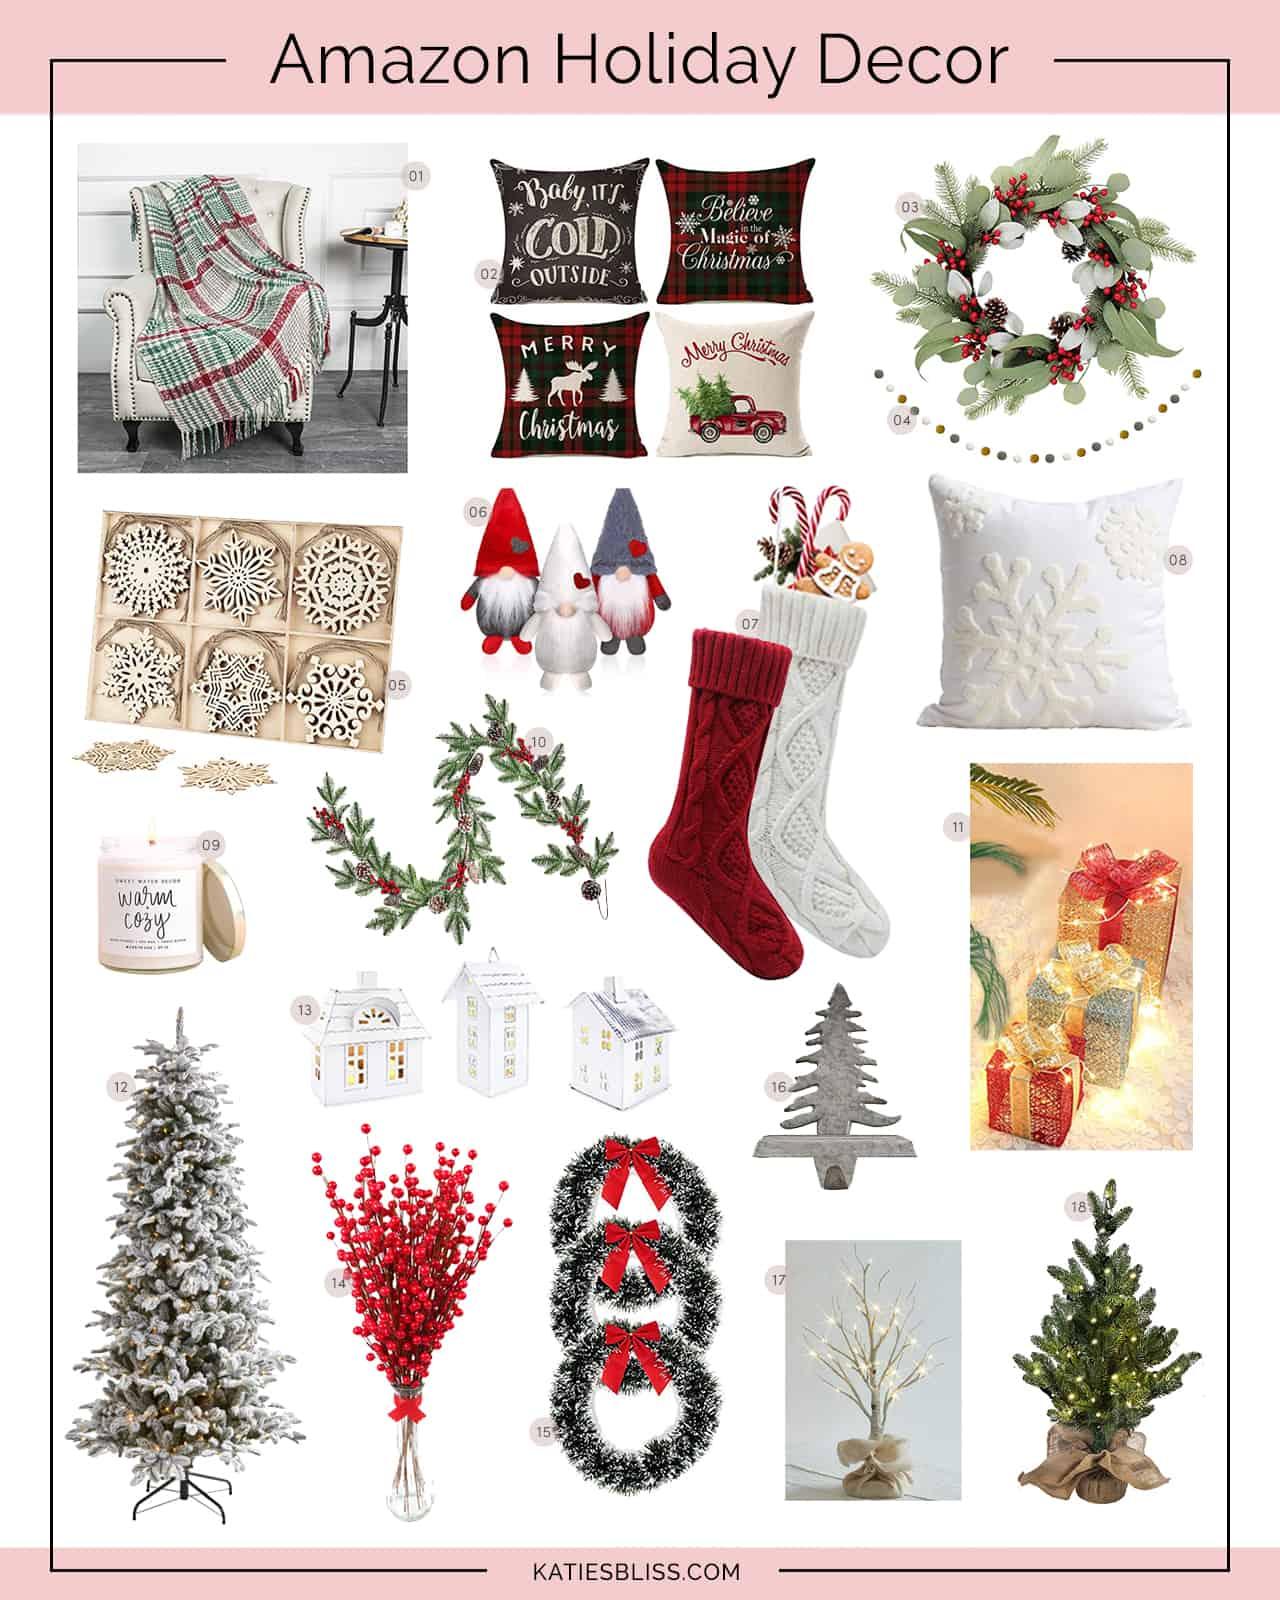 Katies Bliss Amazon Holiday Decor